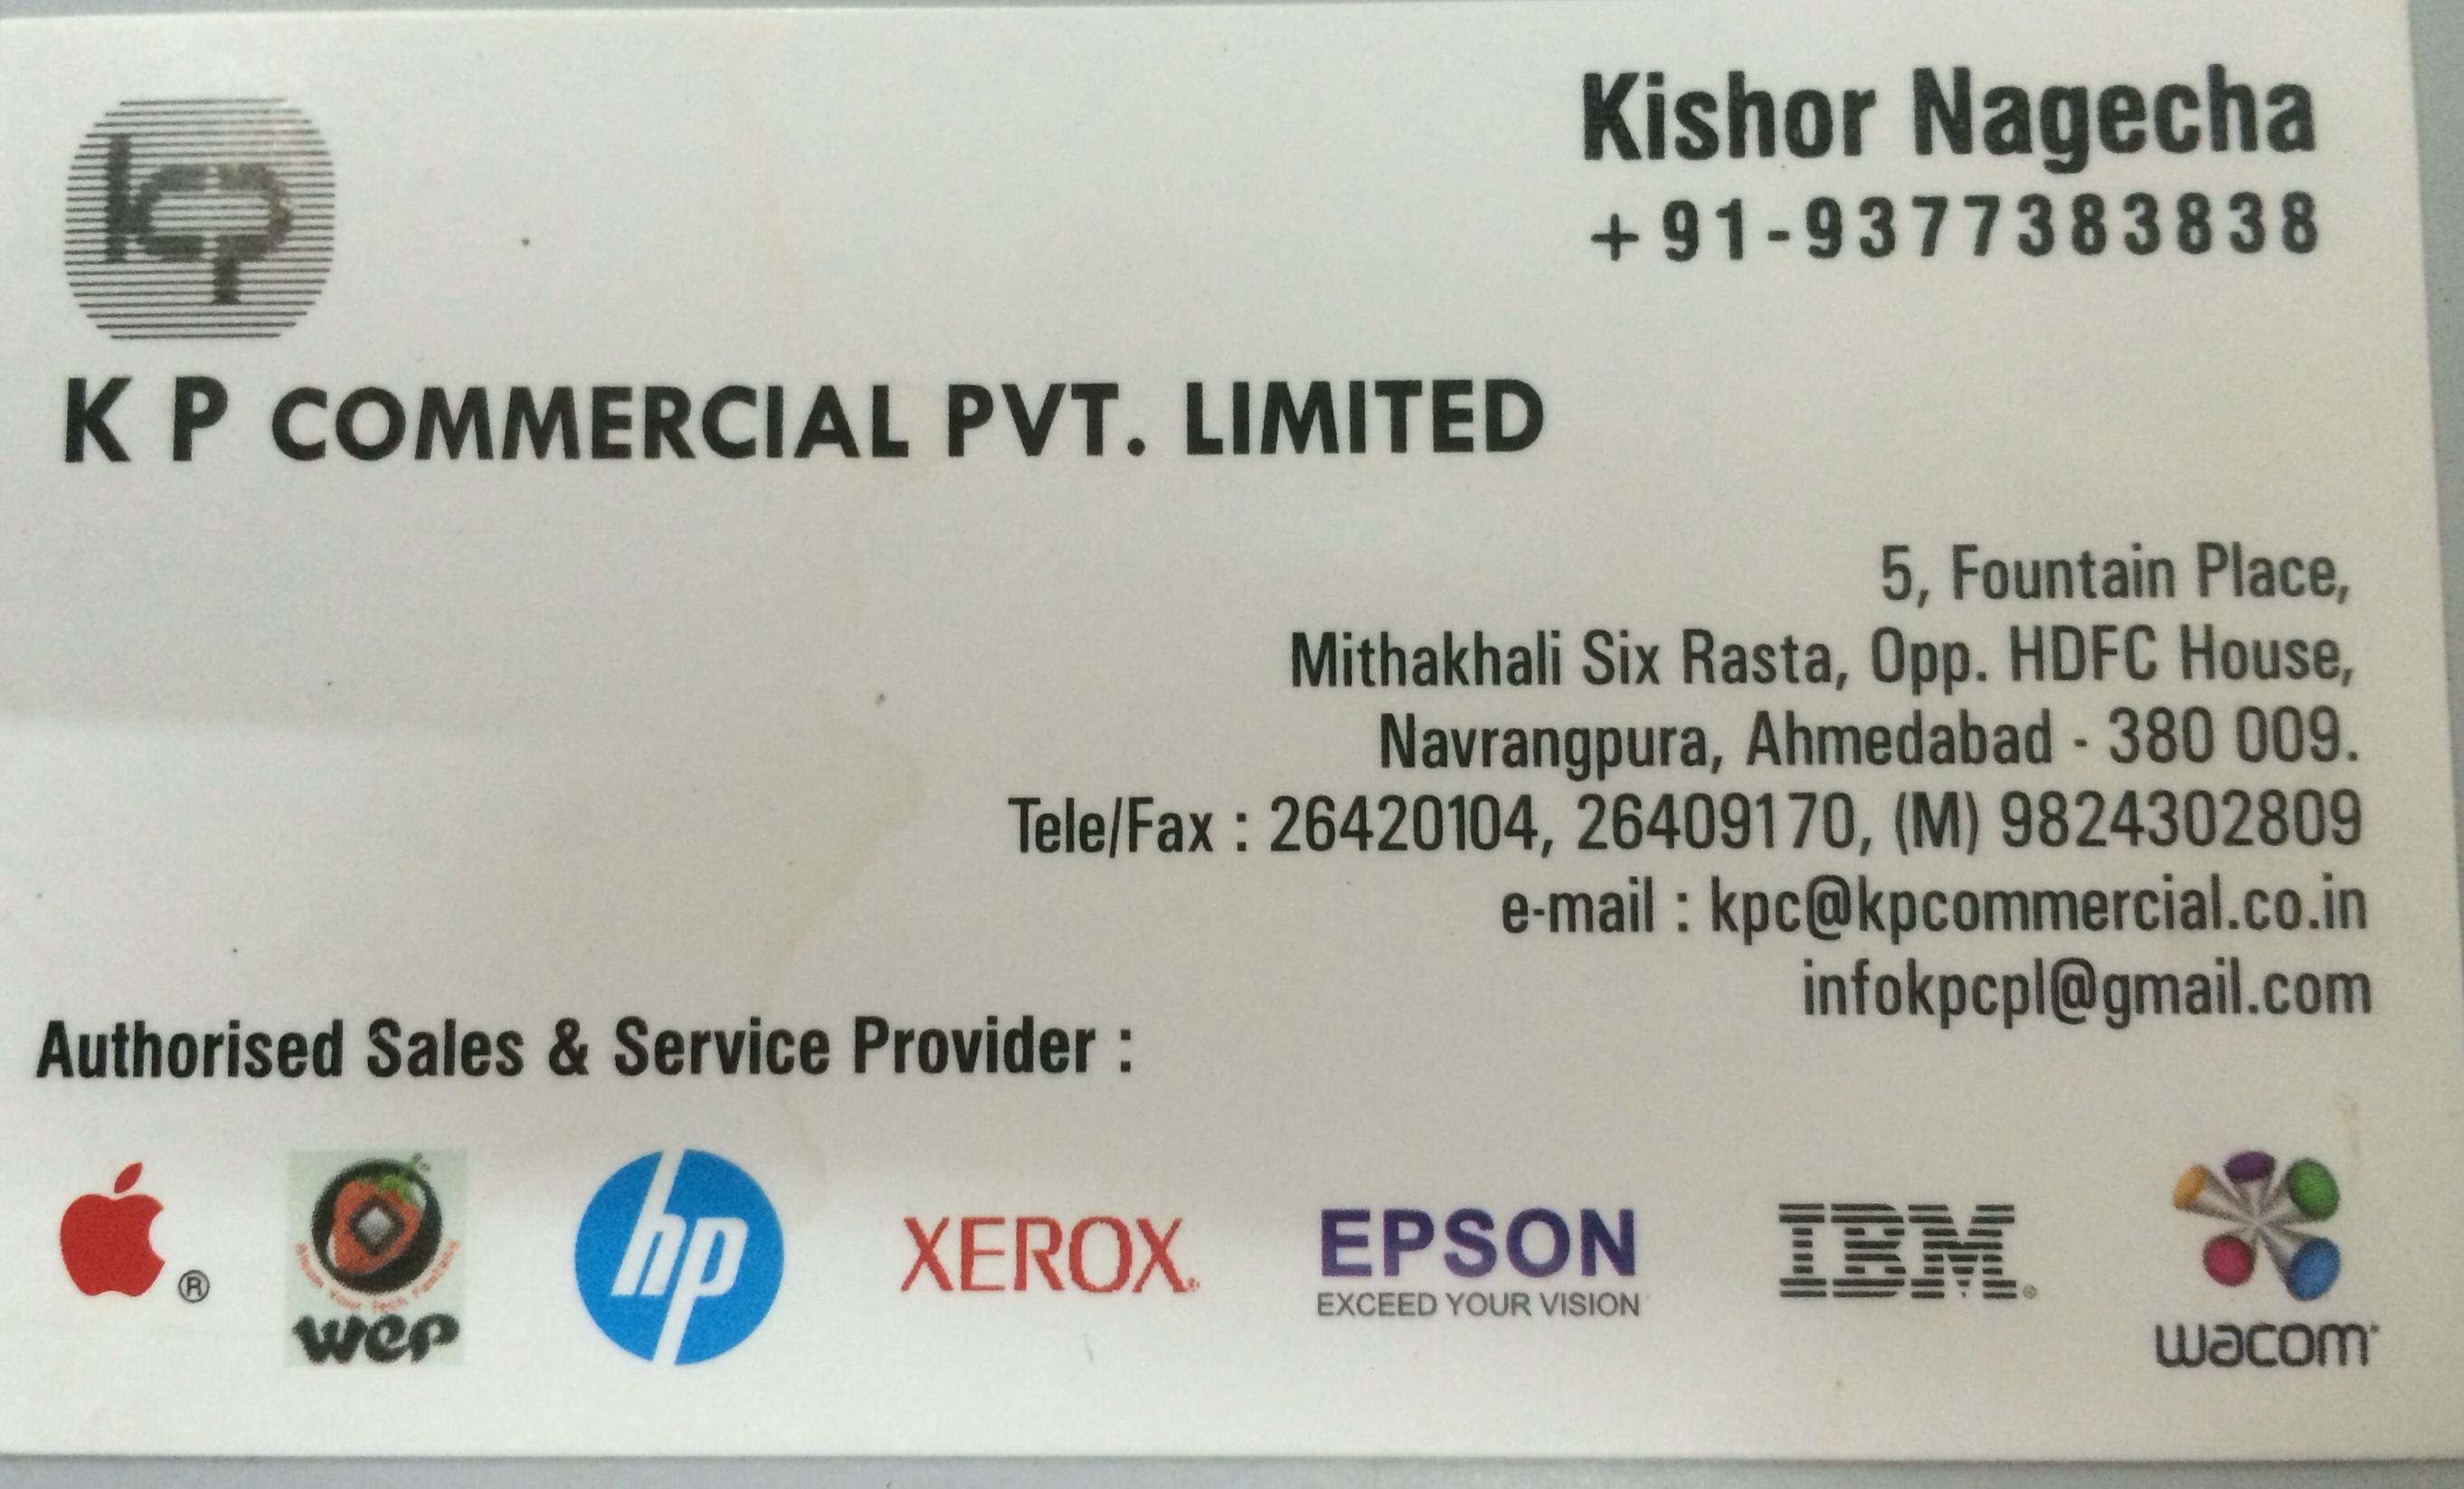 K P Commercial Pvt Ltd